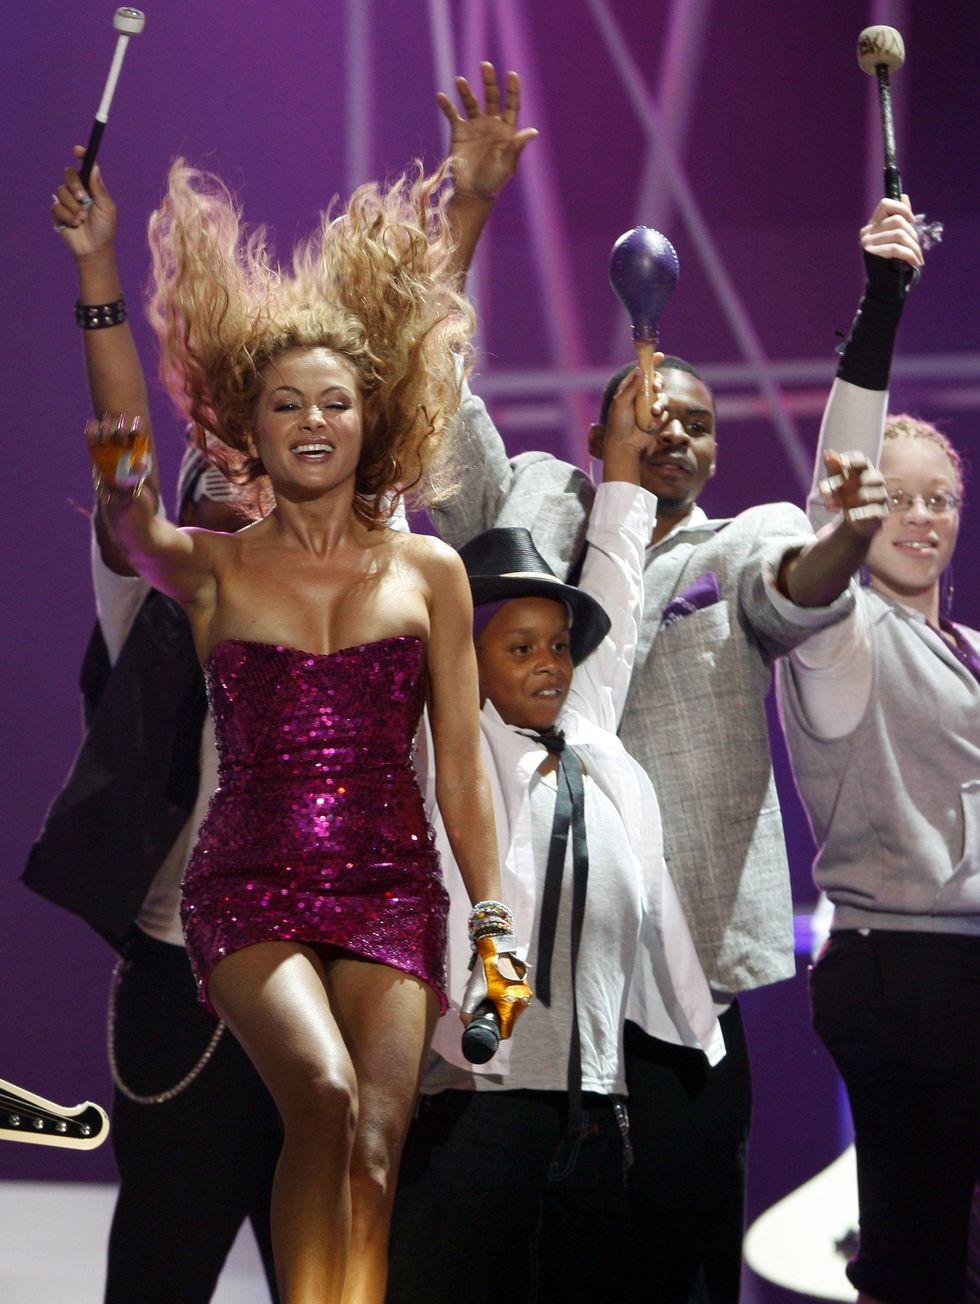 paulina-rubio-at-the-2009-billboard-latin-music-awards-01